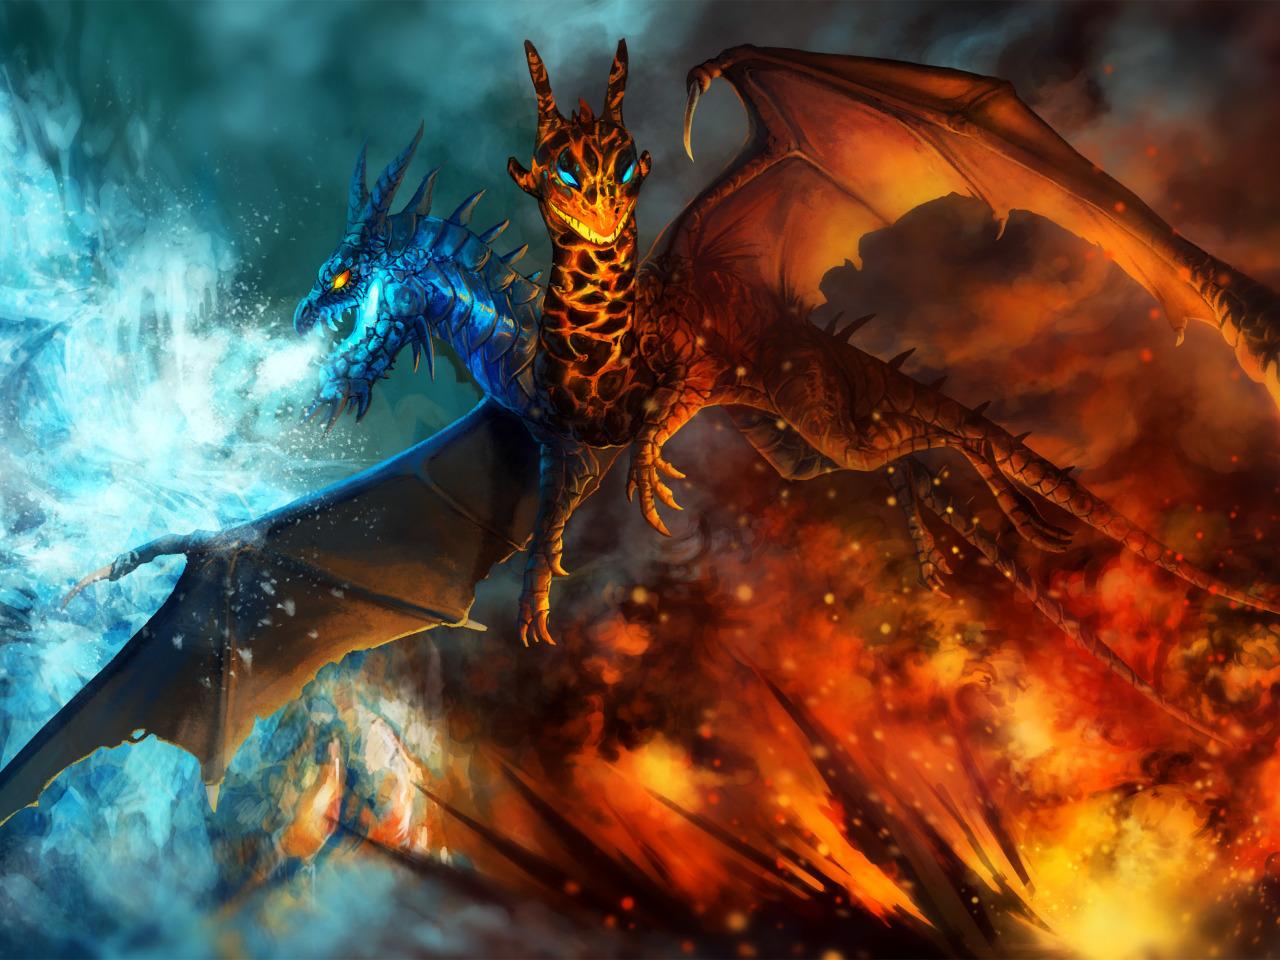 подготовили картинки дракона льда и пламени после